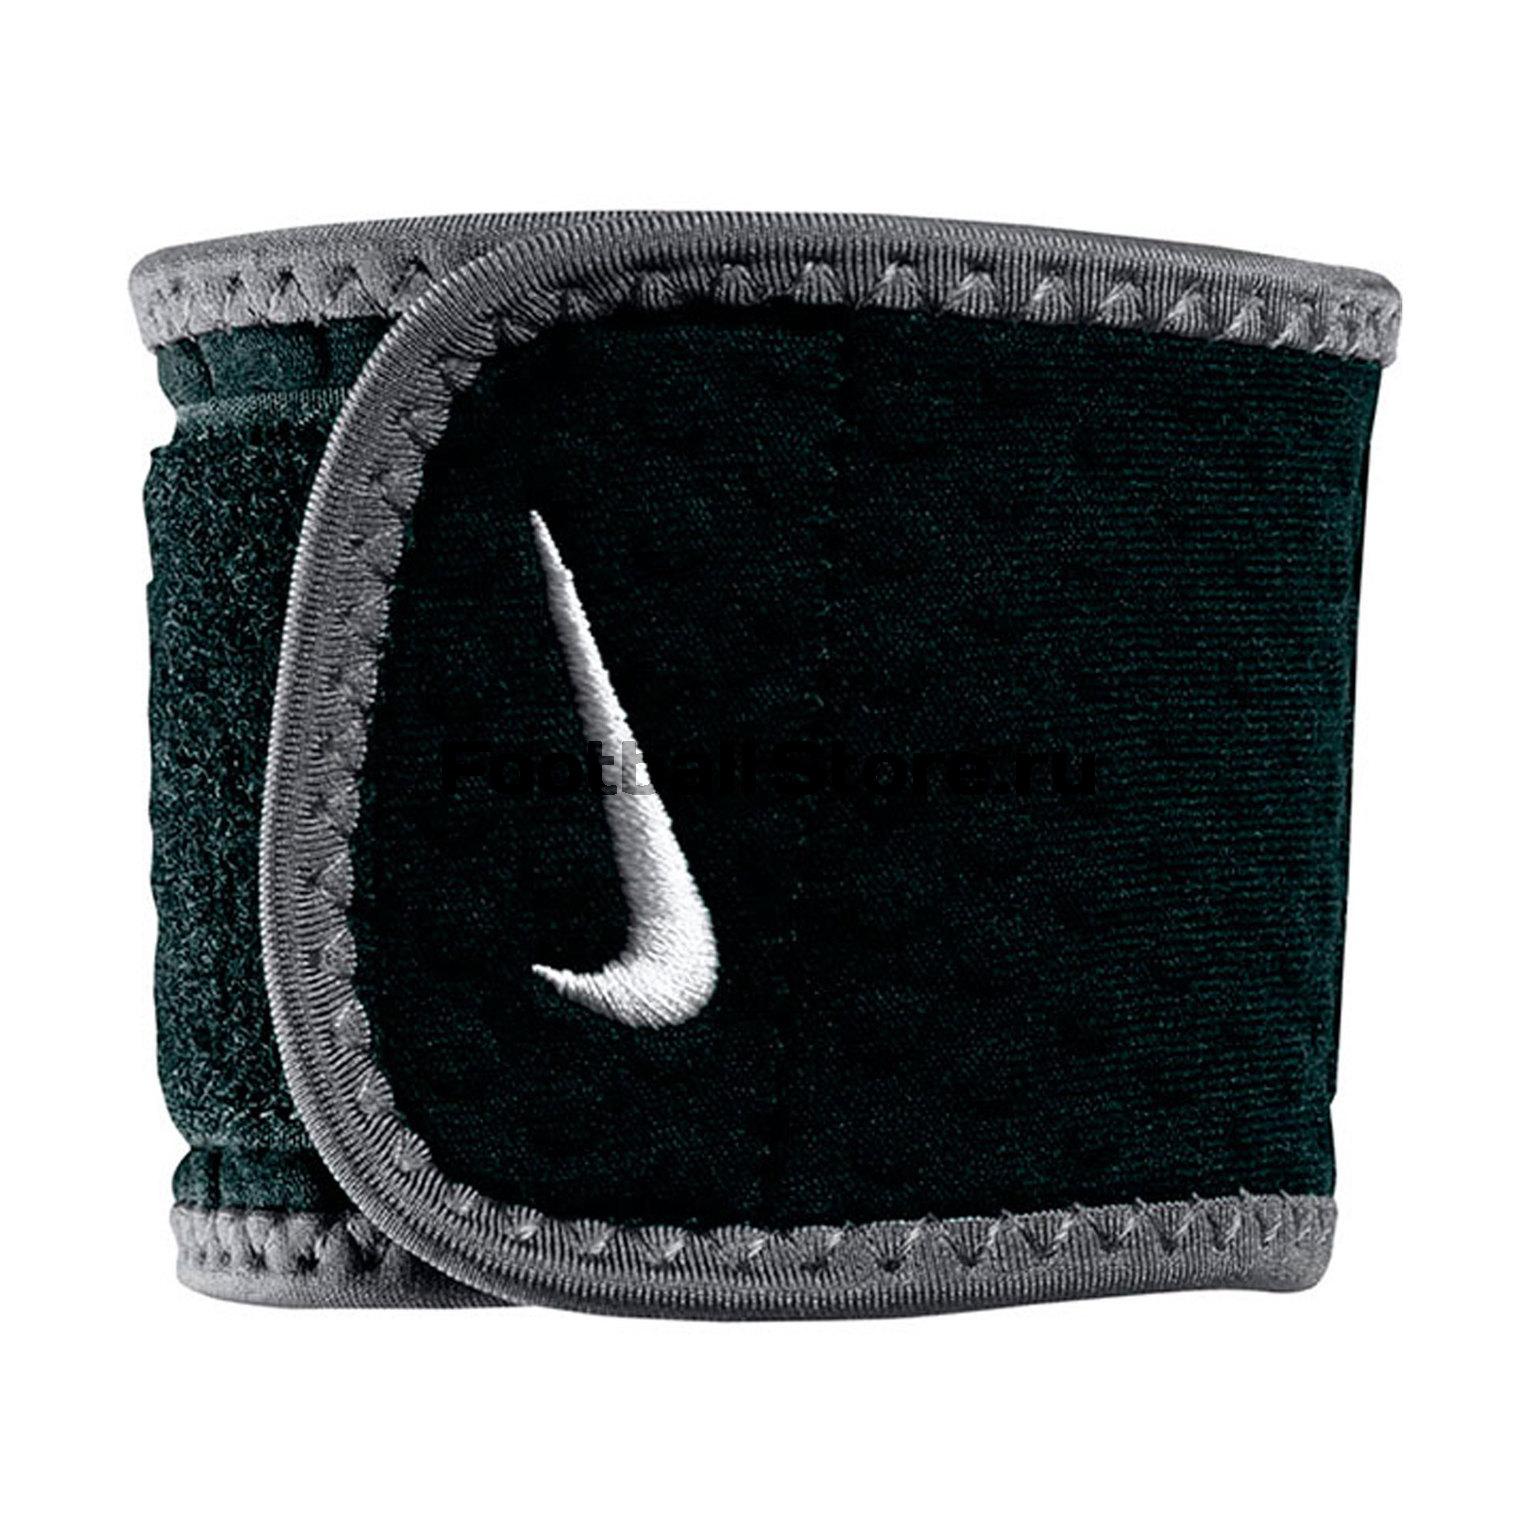 Лангетка на запястье Nike WRIST Wpap 9.337.030.020